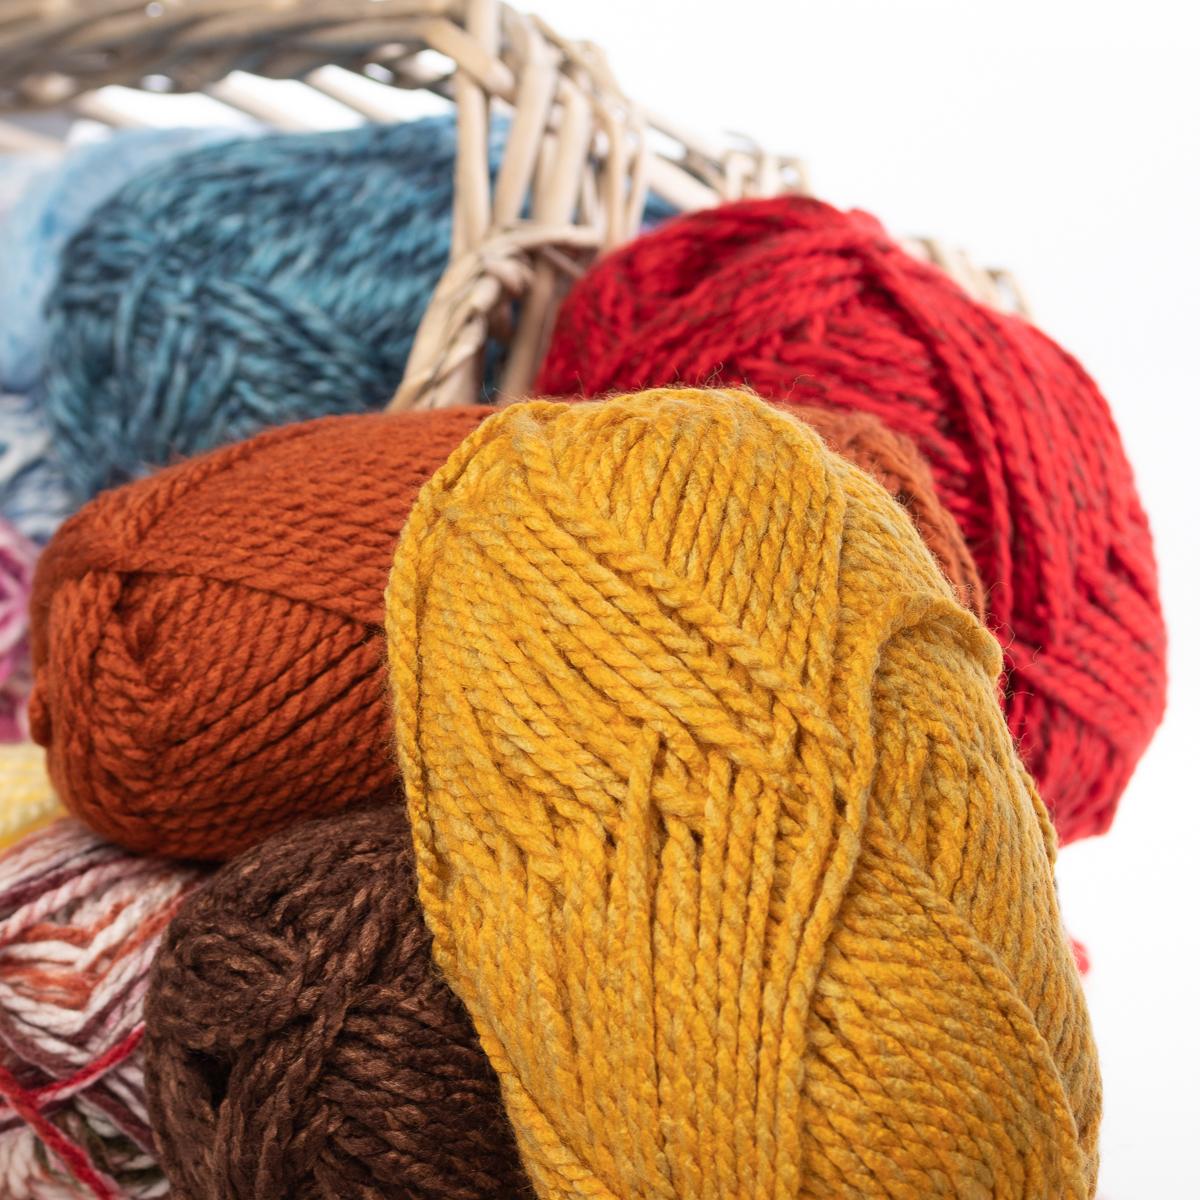 3pk-Premier-Yarns-Deborah-Norville-Serenity-100-Acrylic-Yarn-Chunky-5-Knitting thumbnail 49